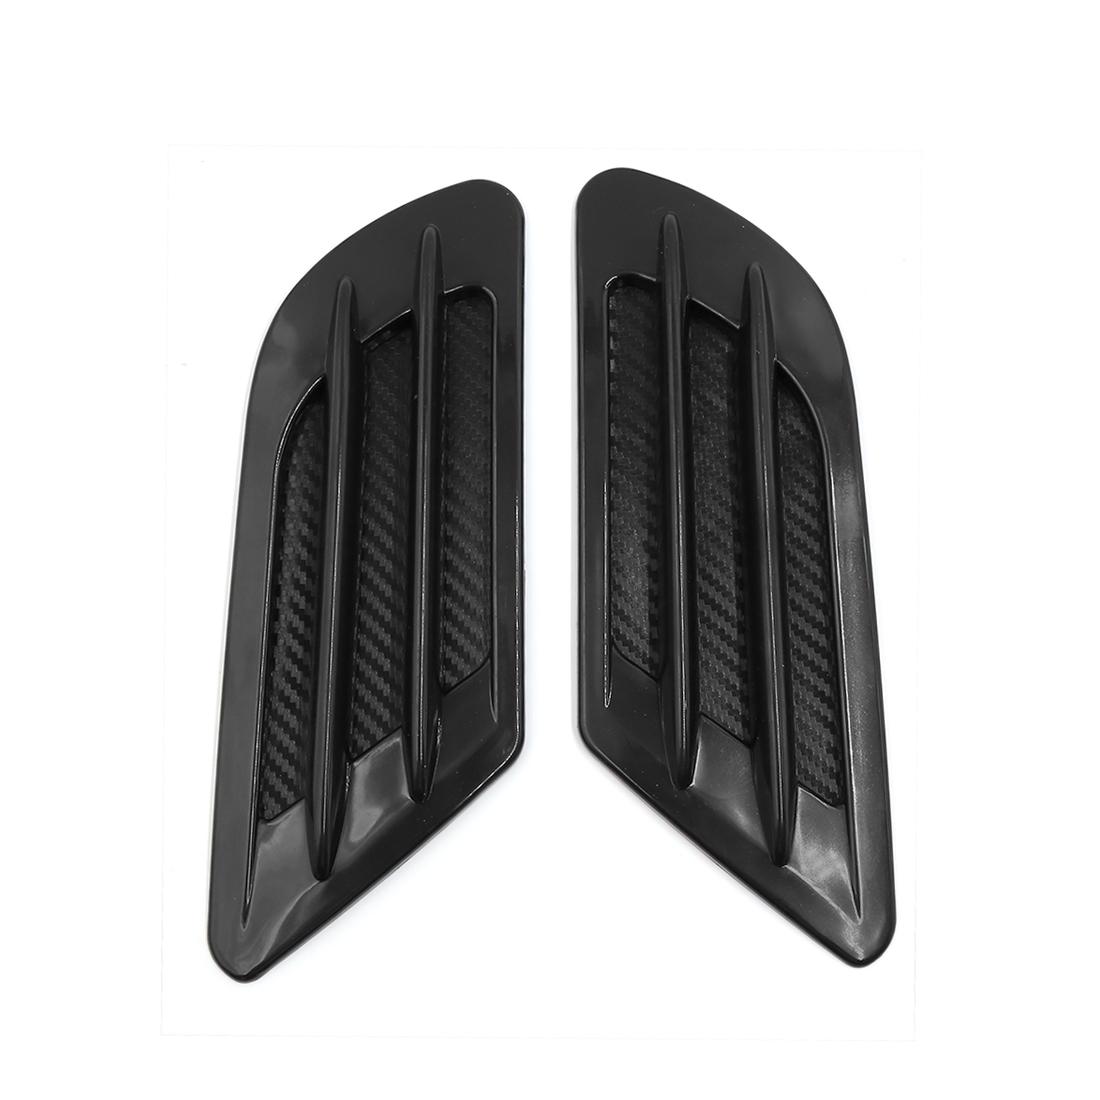 2 Pcs Carbon Fiber Print Car Fender Side Air Intake Flow Vent Cover Hood Sticker